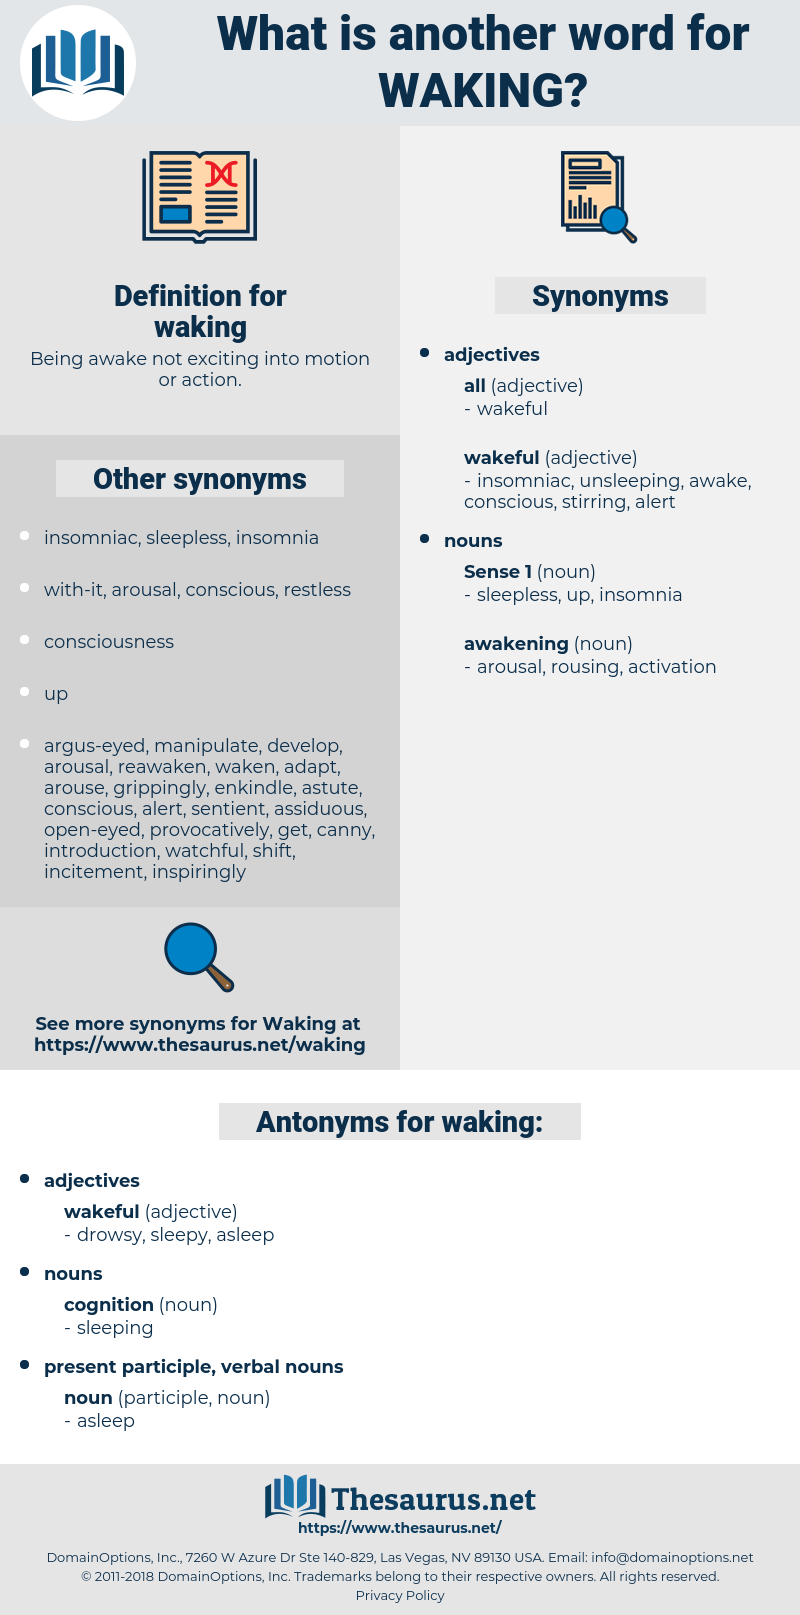 waking, synonym waking, another word for waking, words like waking, thesaurus waking